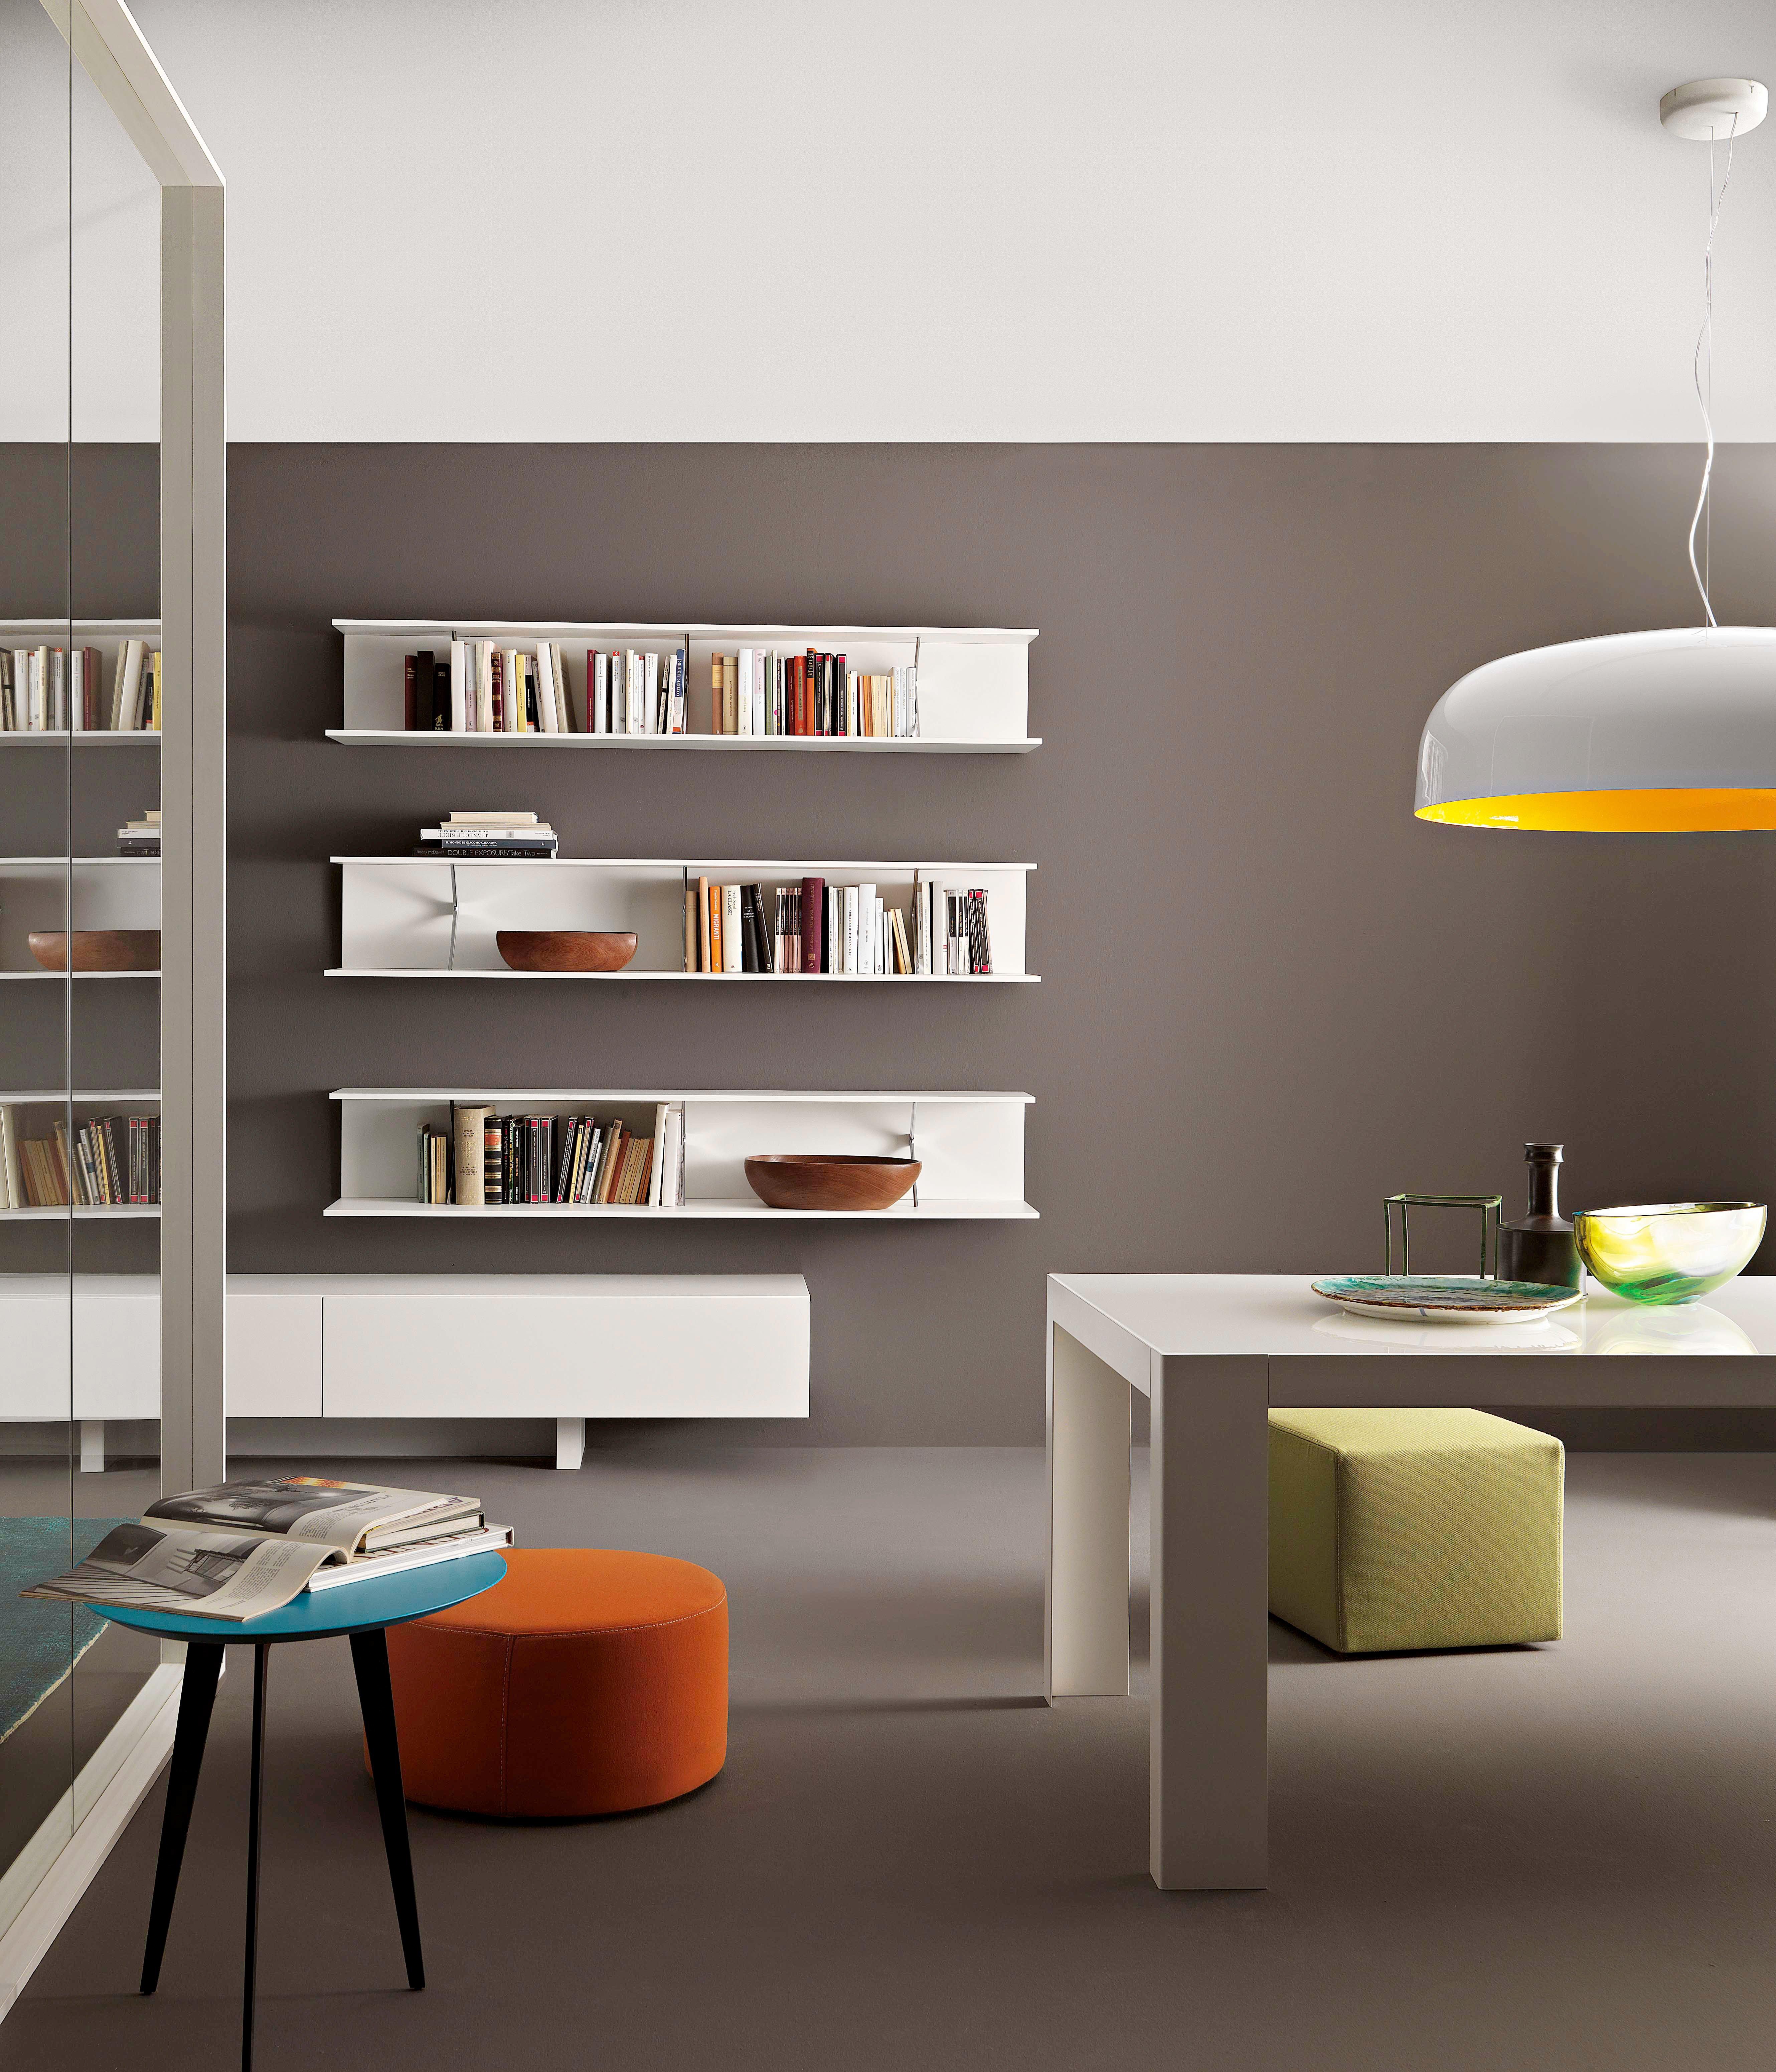 Lema mimi libreria cose di casa for Libreria lema